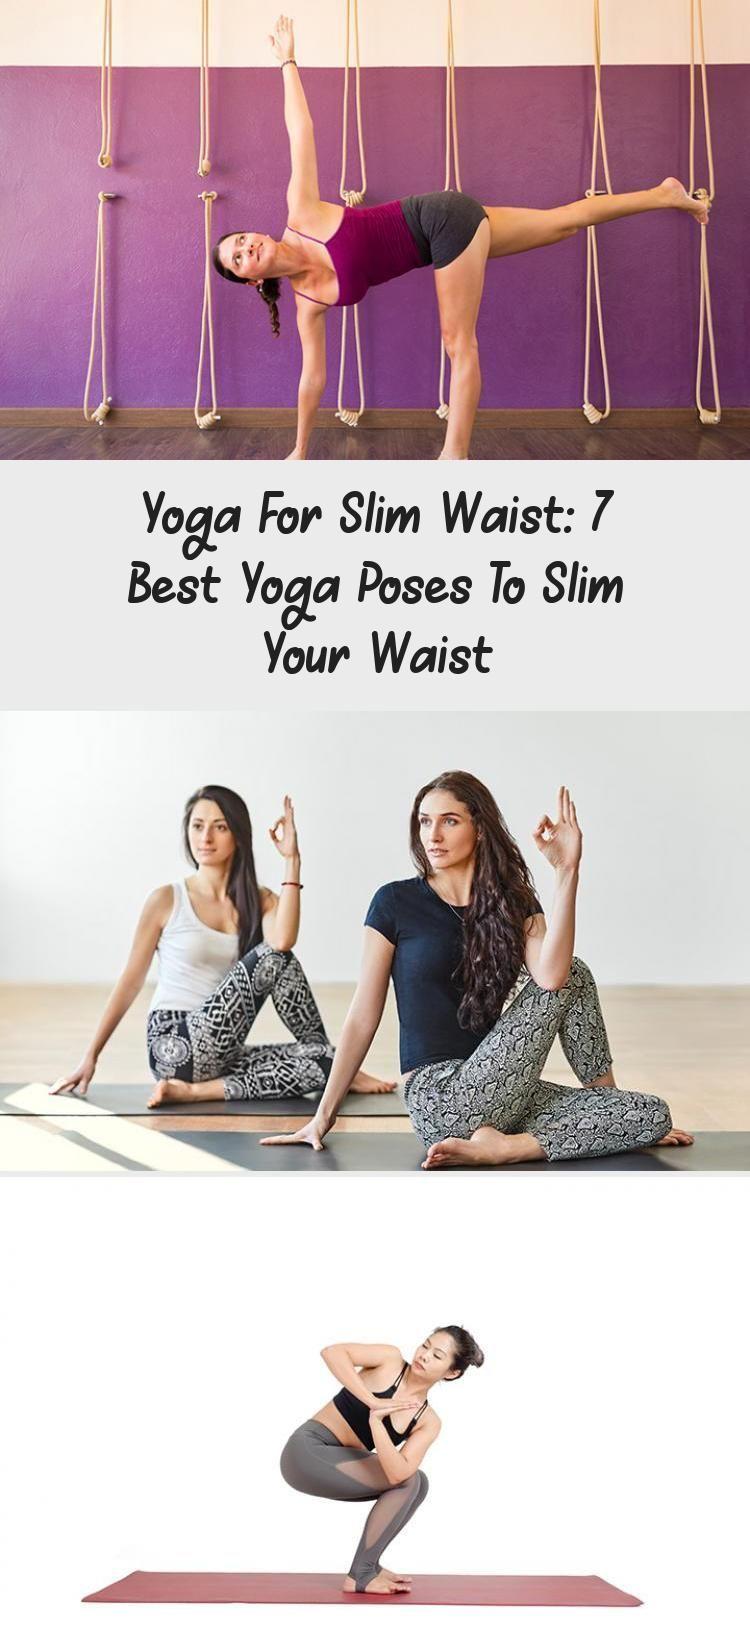 Yoga For Slim Waist 7 Best Yoga Poses To Slim Your Waist Modifiedyogaposesforbeginners Yogaposesforbeginnersm Yoga Poses Advanced Cool Yoga Poses Slim Waist